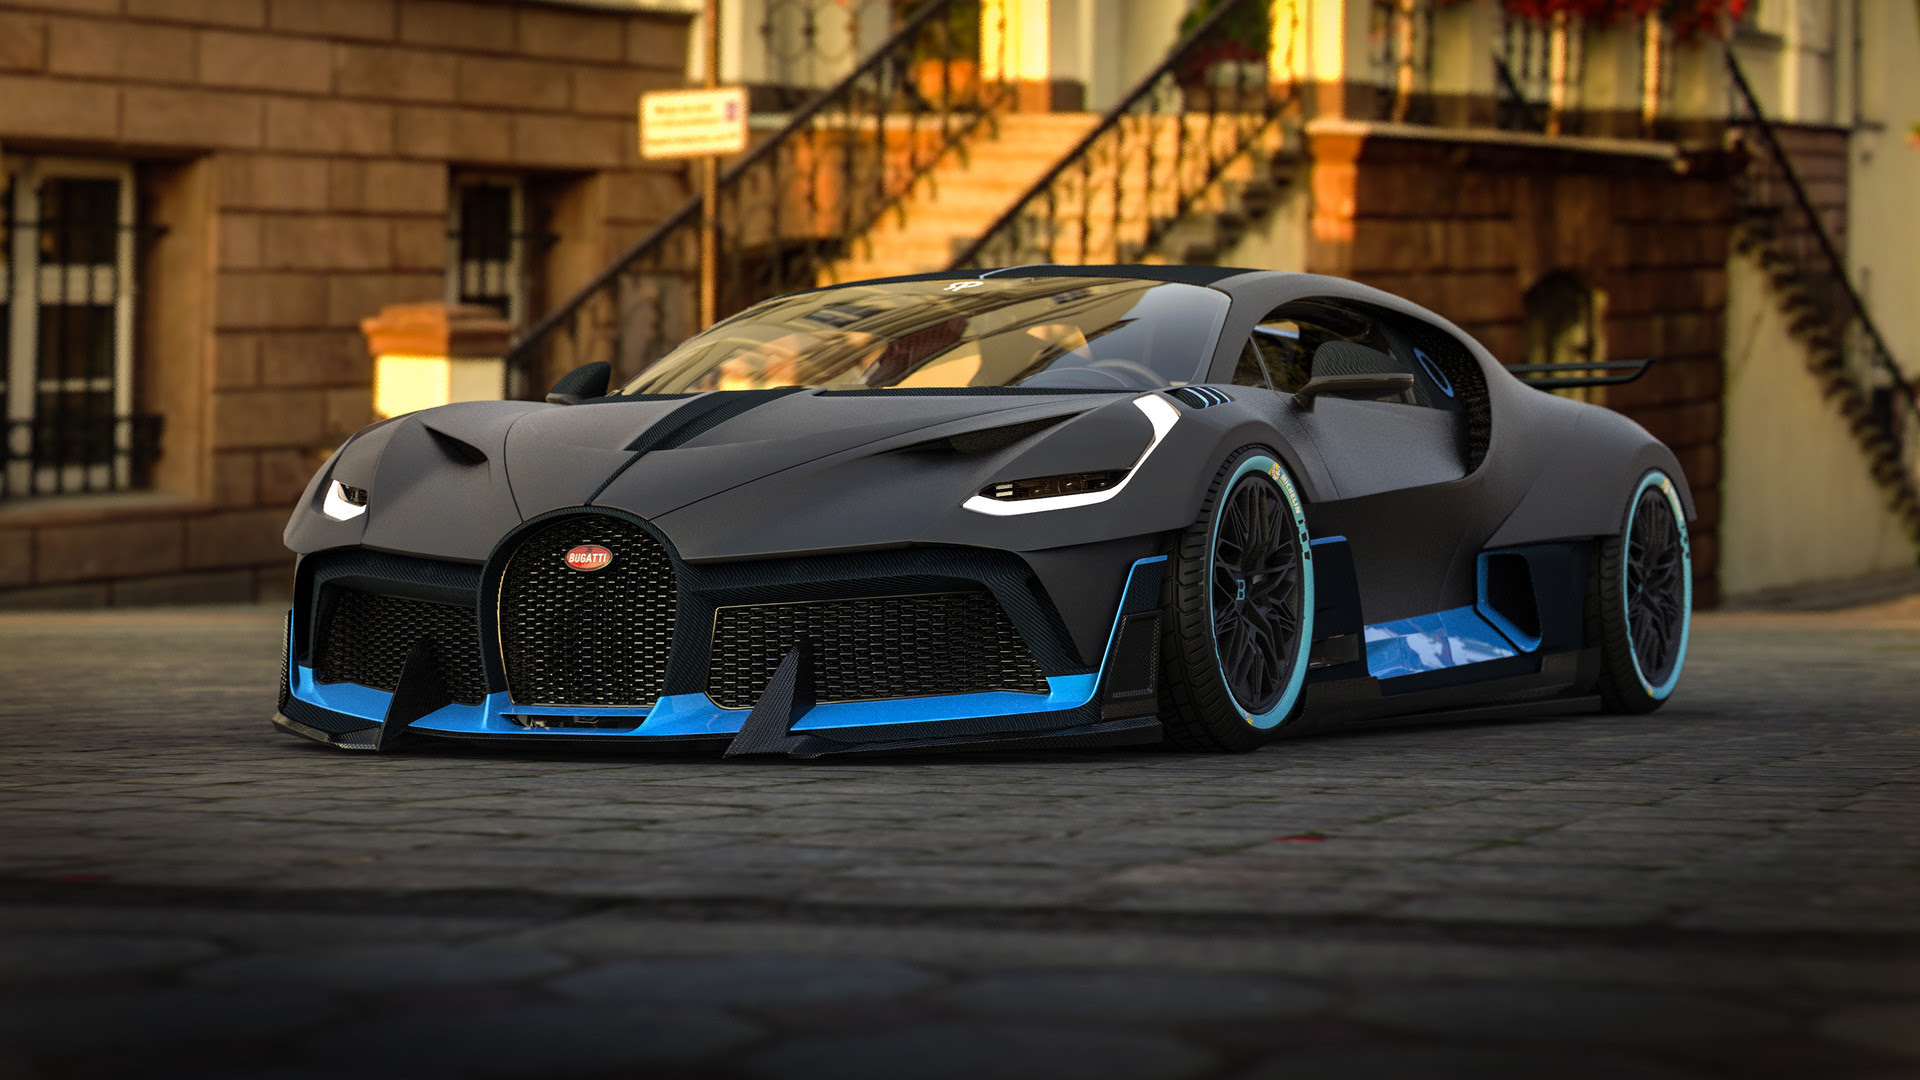 Bugatti Divo 2018 Art, HD Cars, 4k Wallpapers, Images ...